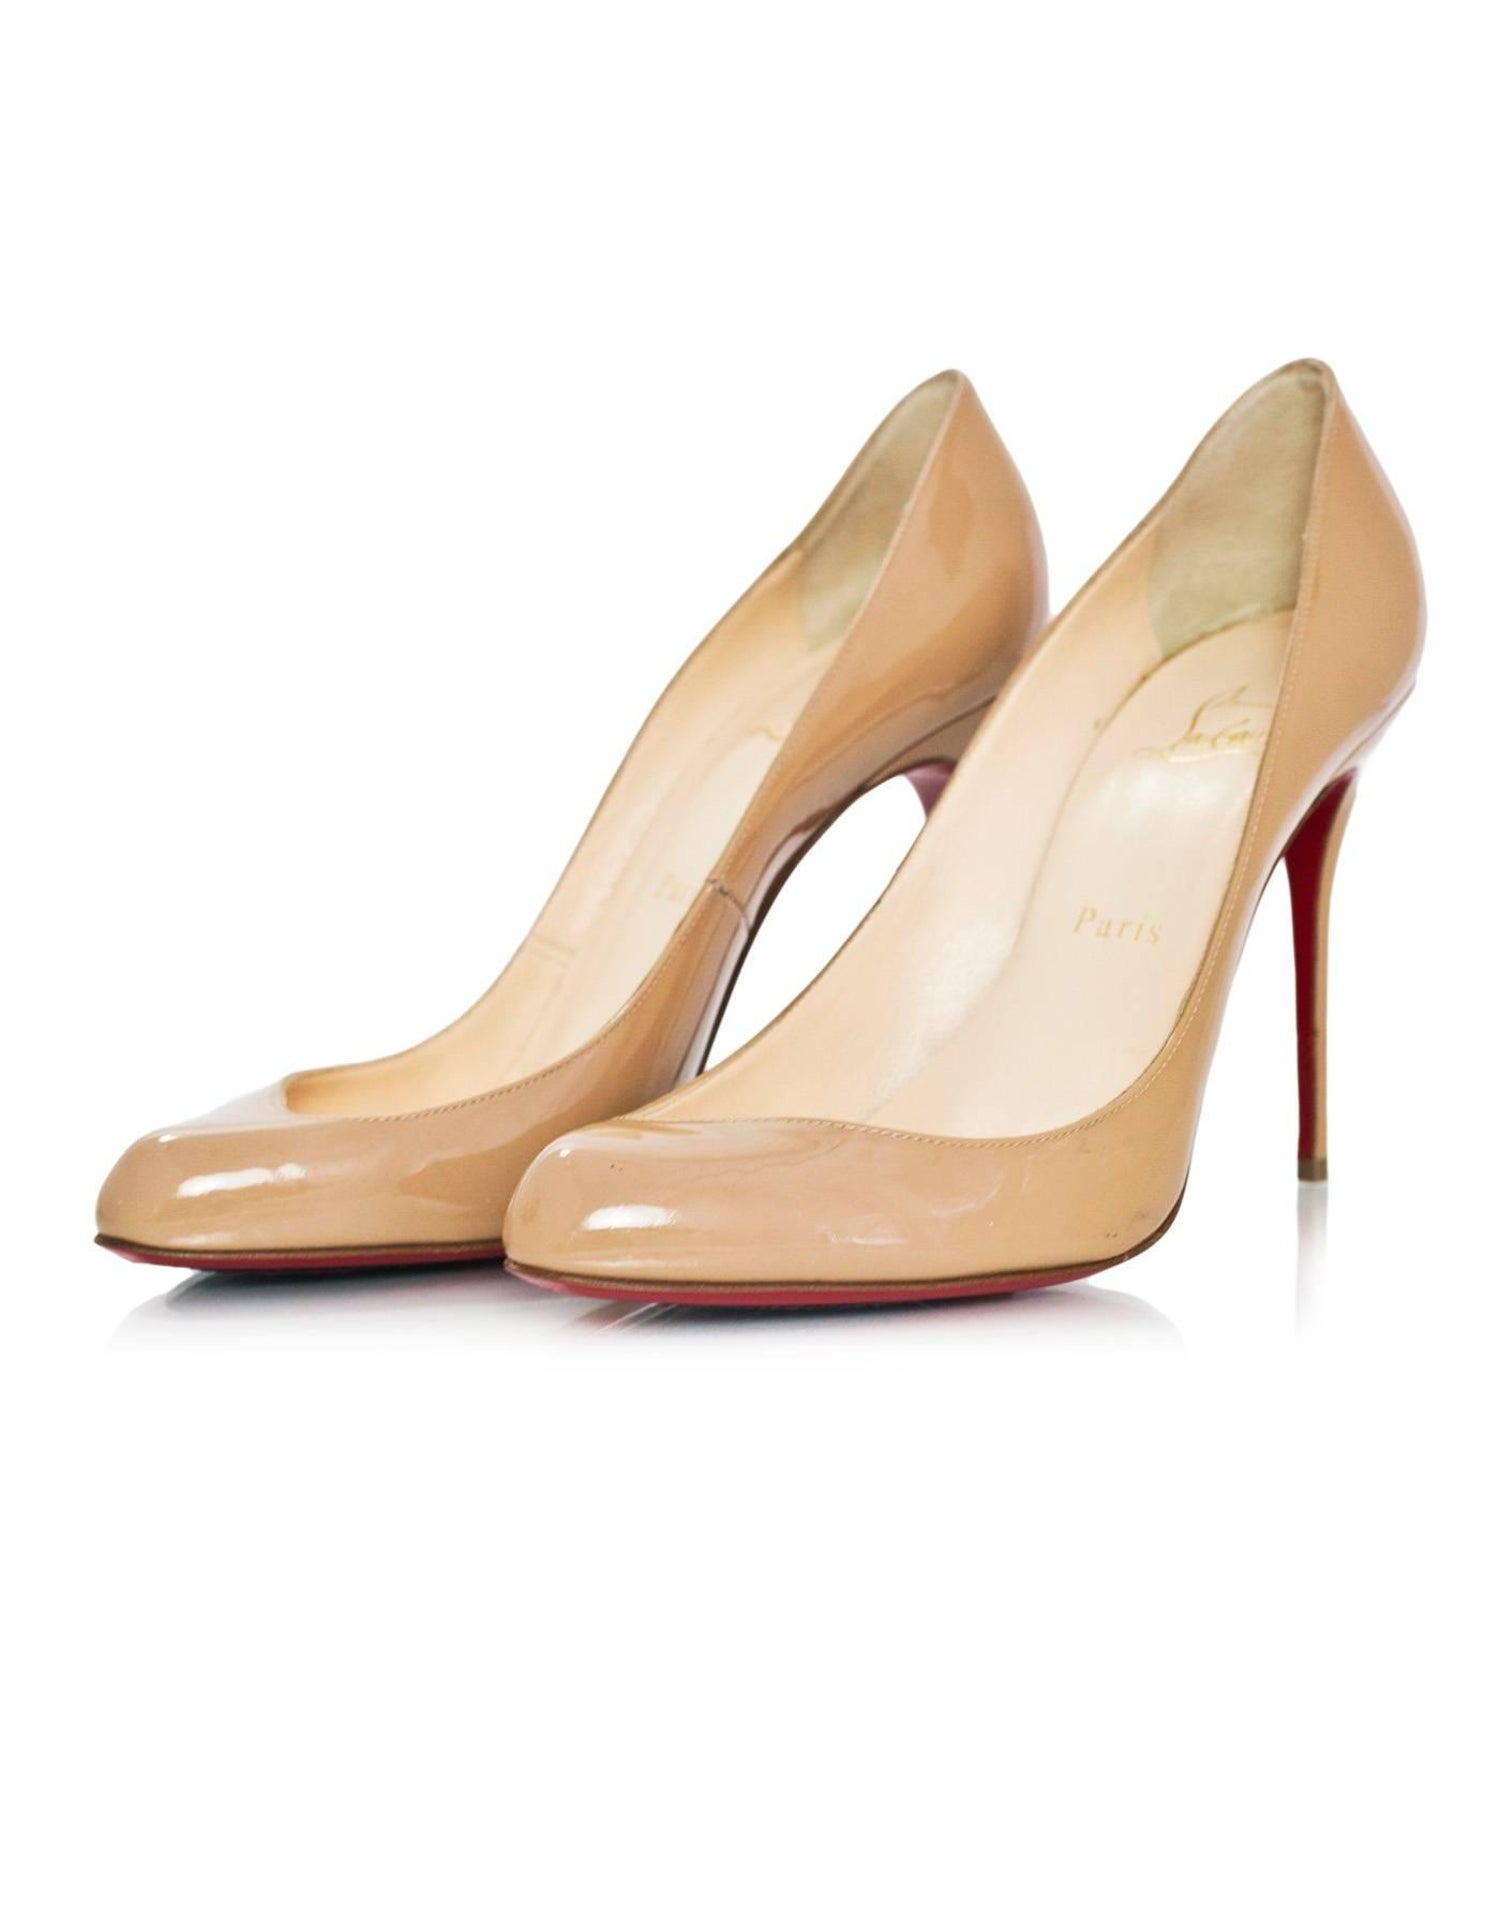 10c0e0ee7f1 Christian Louboutin Nude Patent Leather Maudissima 100 Pumps sz 39